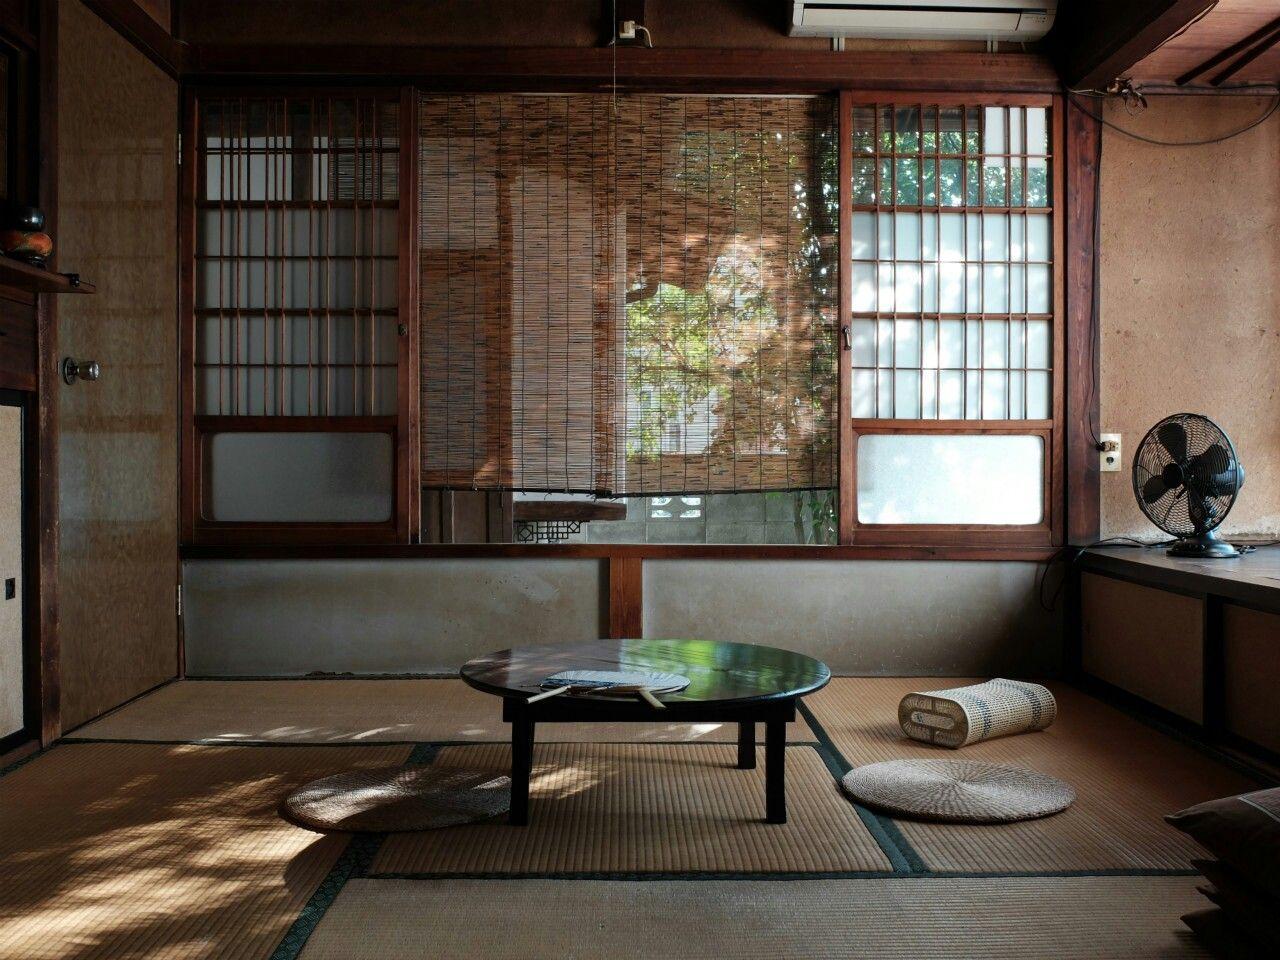 Rooms And Windows おしゃれまとめの人気アイデア Pinterest Yuzo